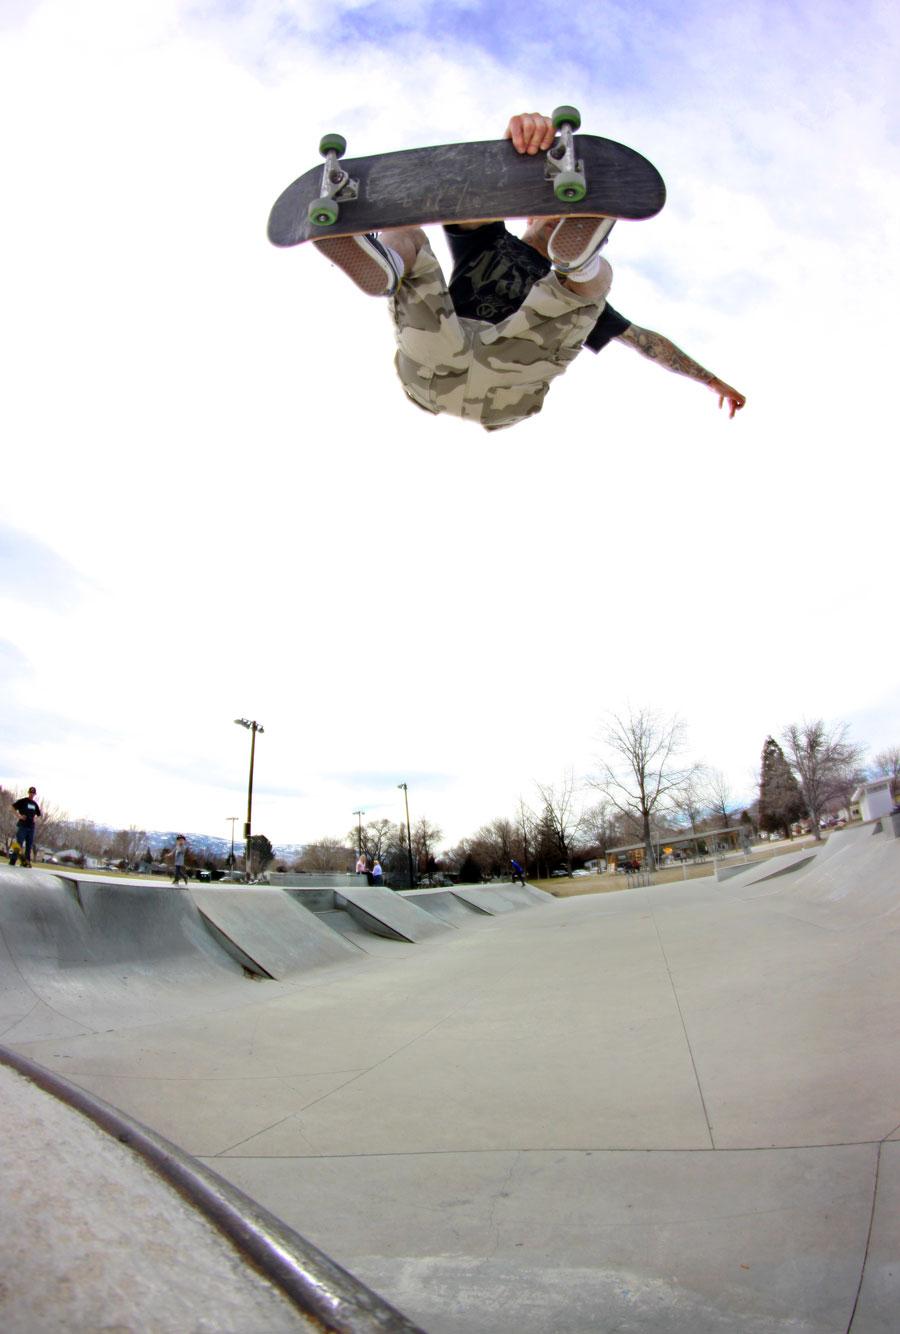 boozer daly burgess skateboarding reno kyle volland